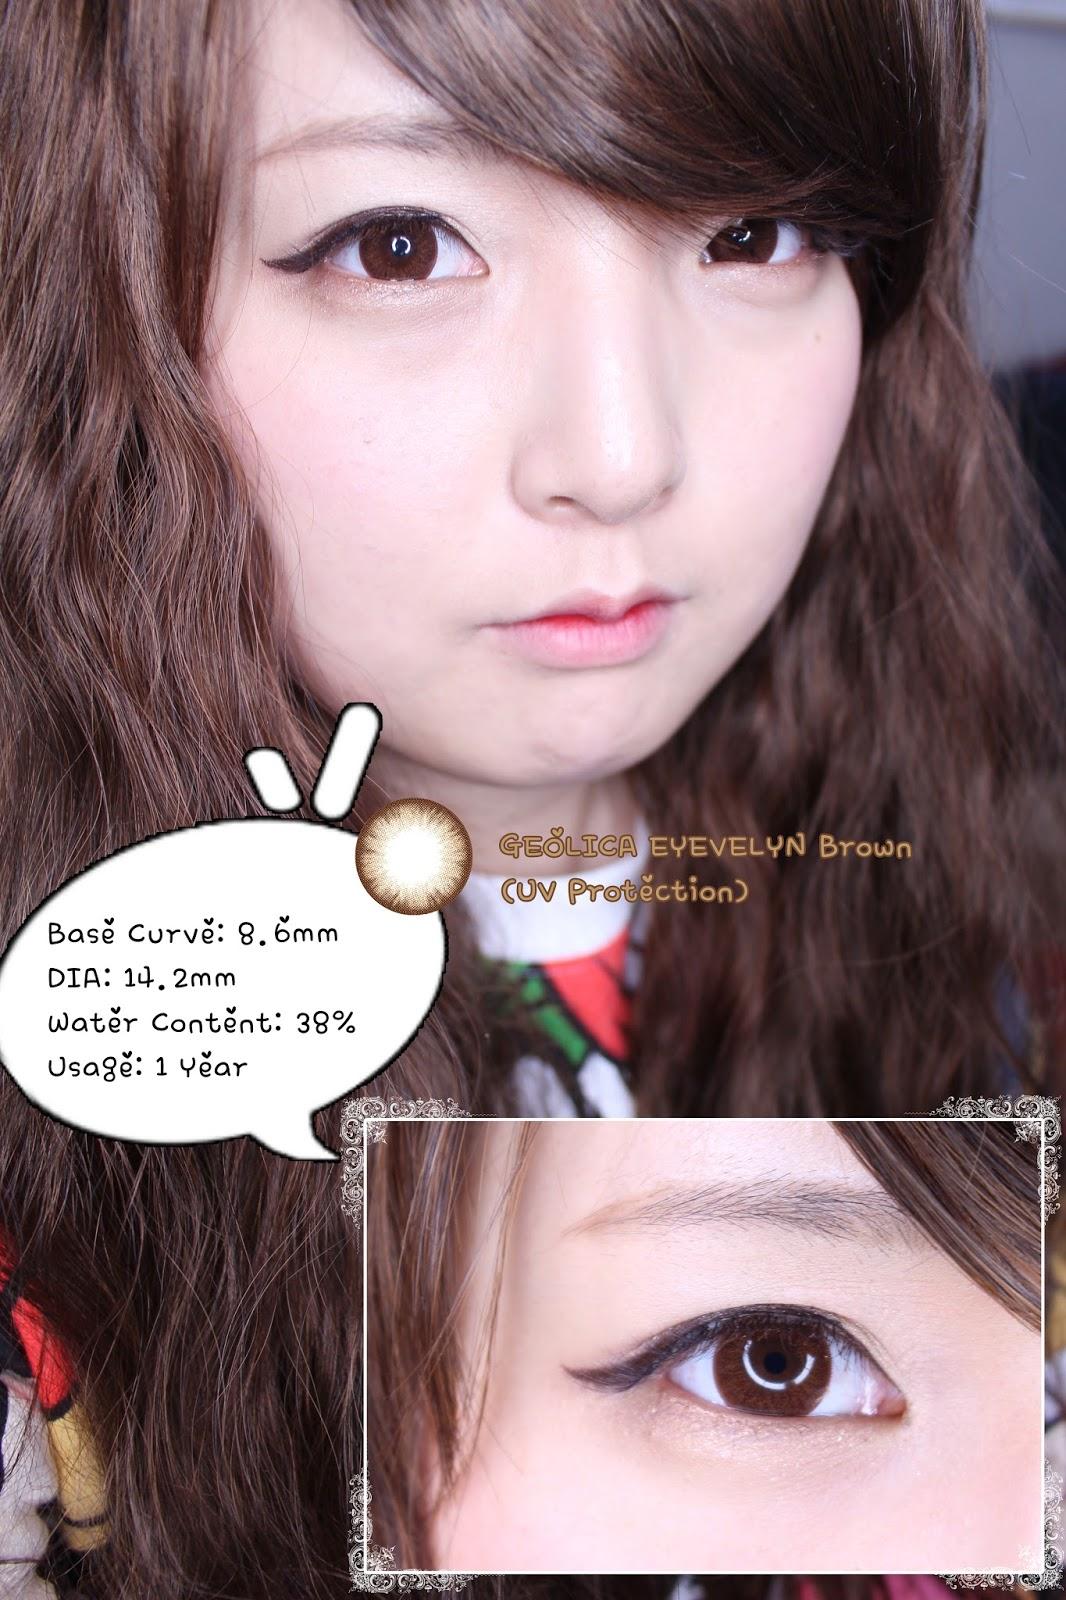 GEO Eyevelyn Brown - HoneyColor